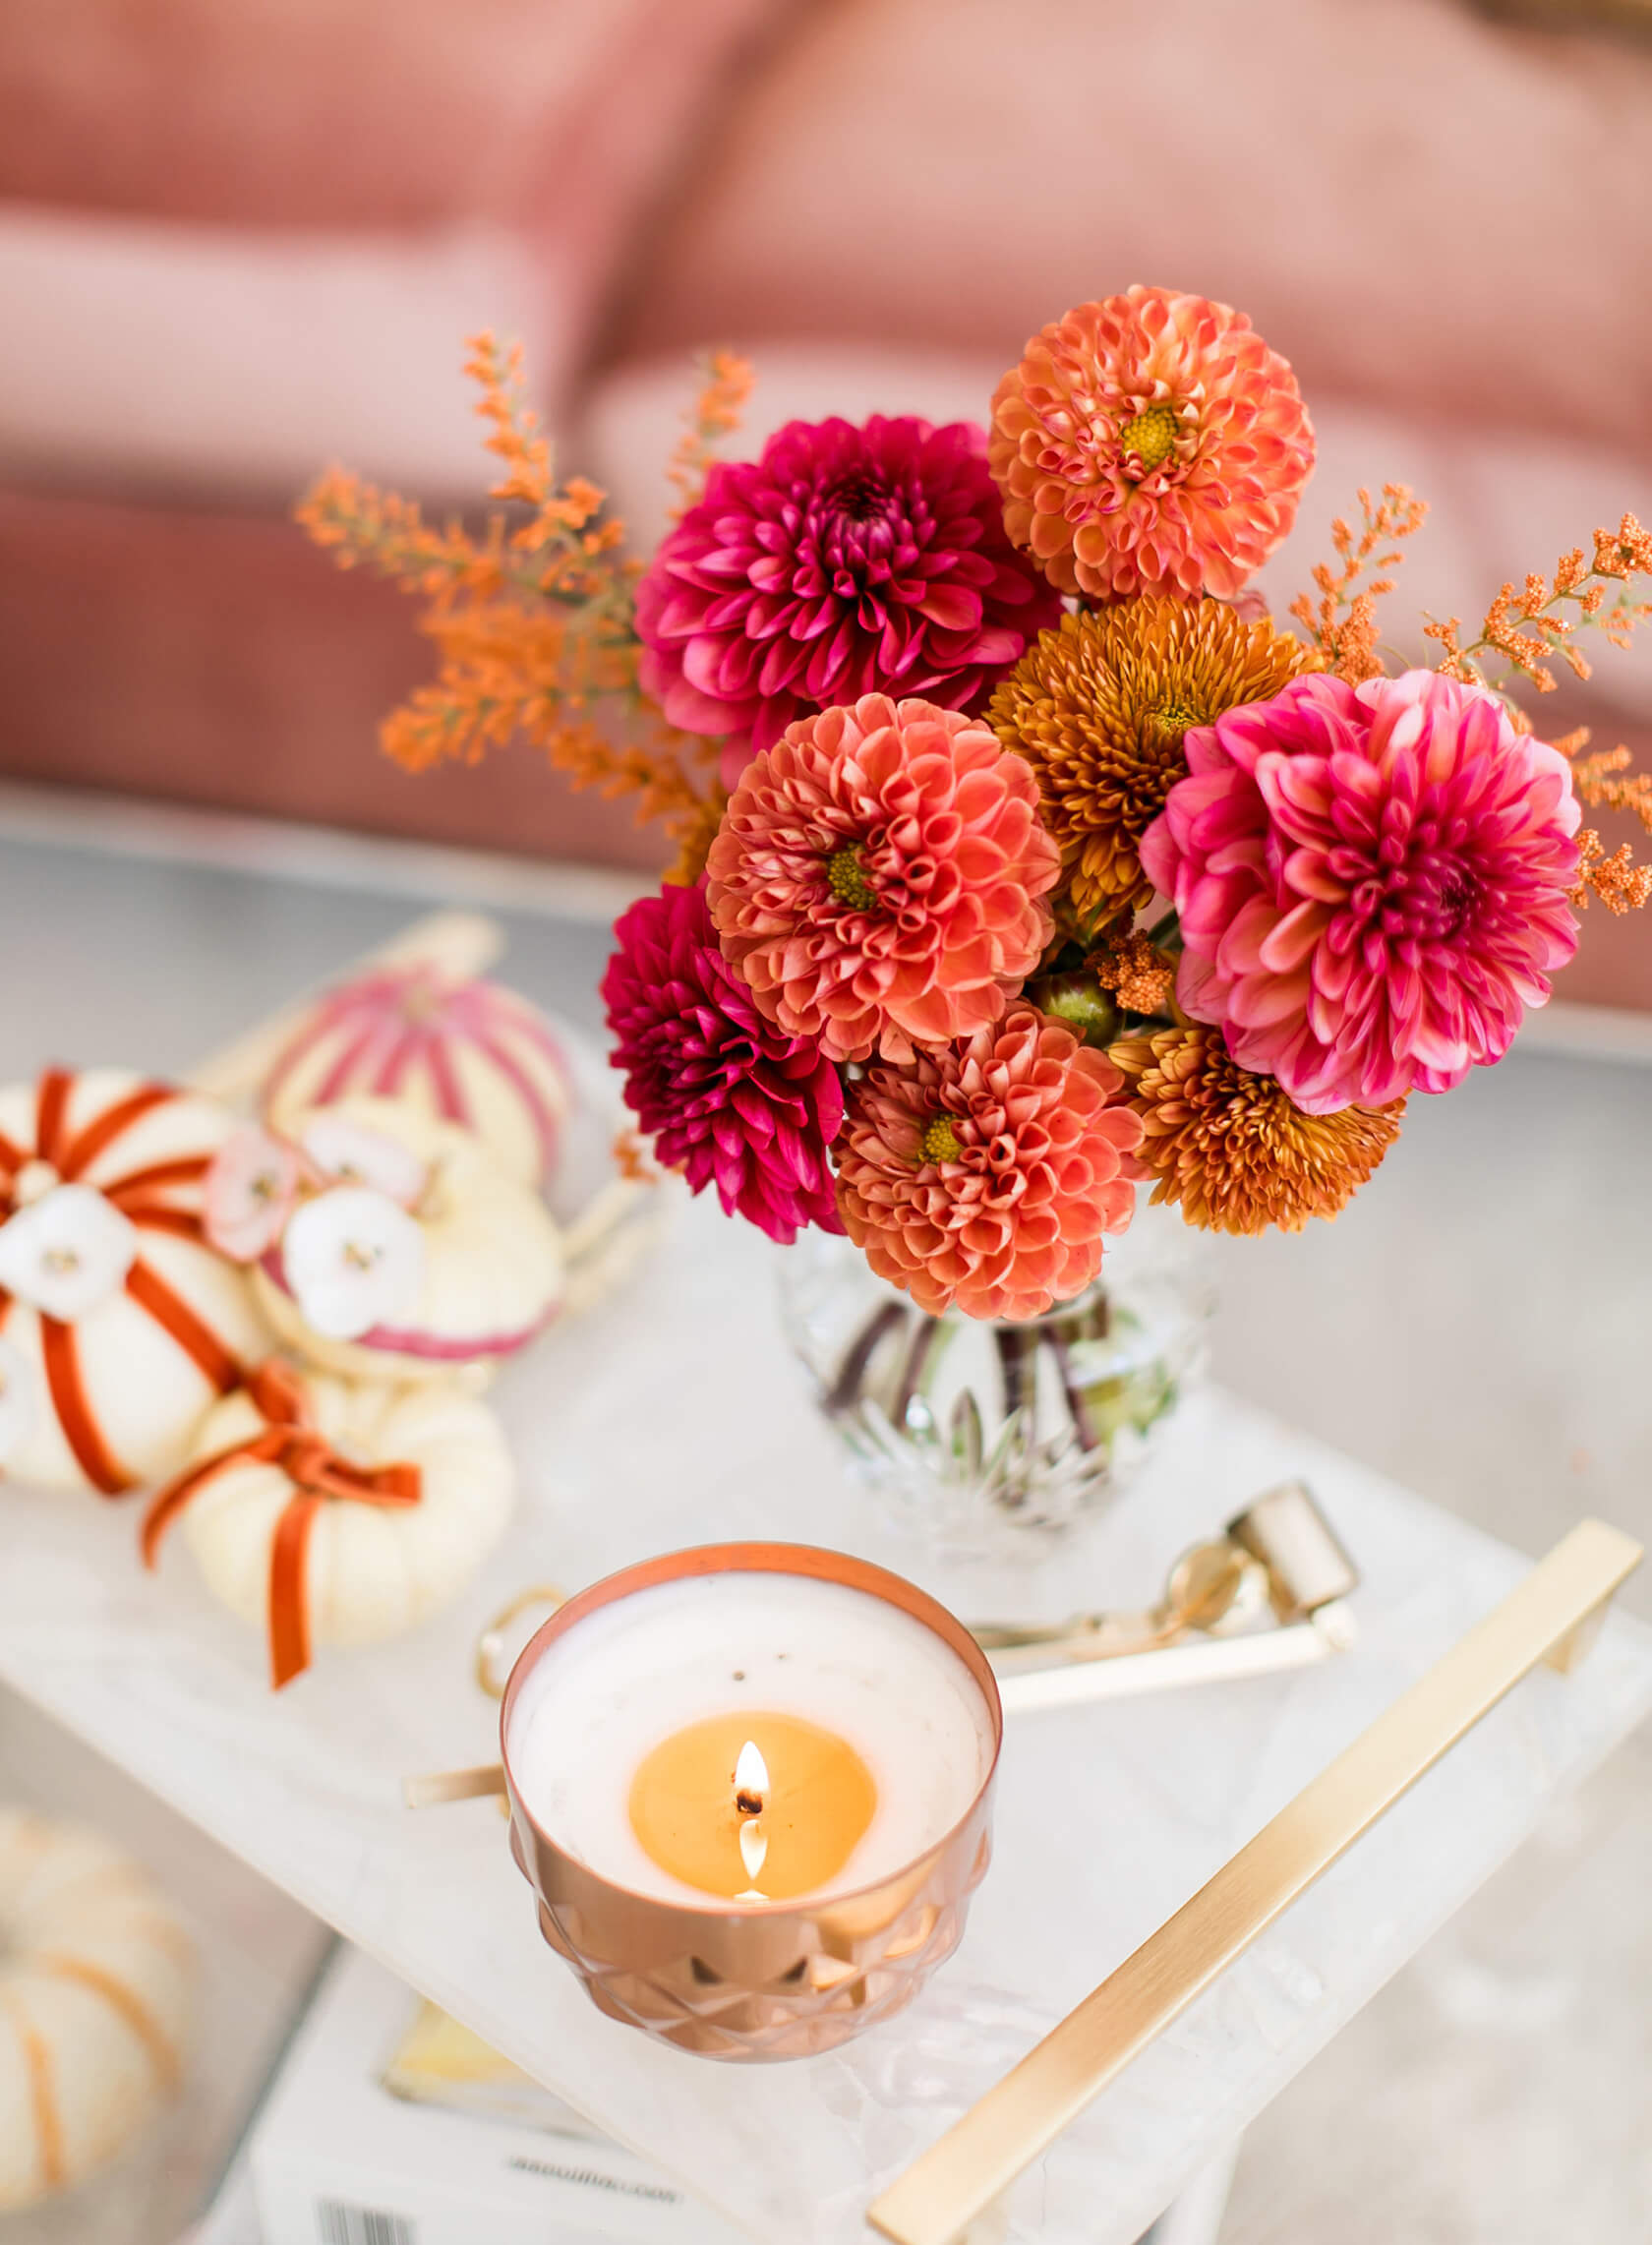 sydne style shows pretty fall floral